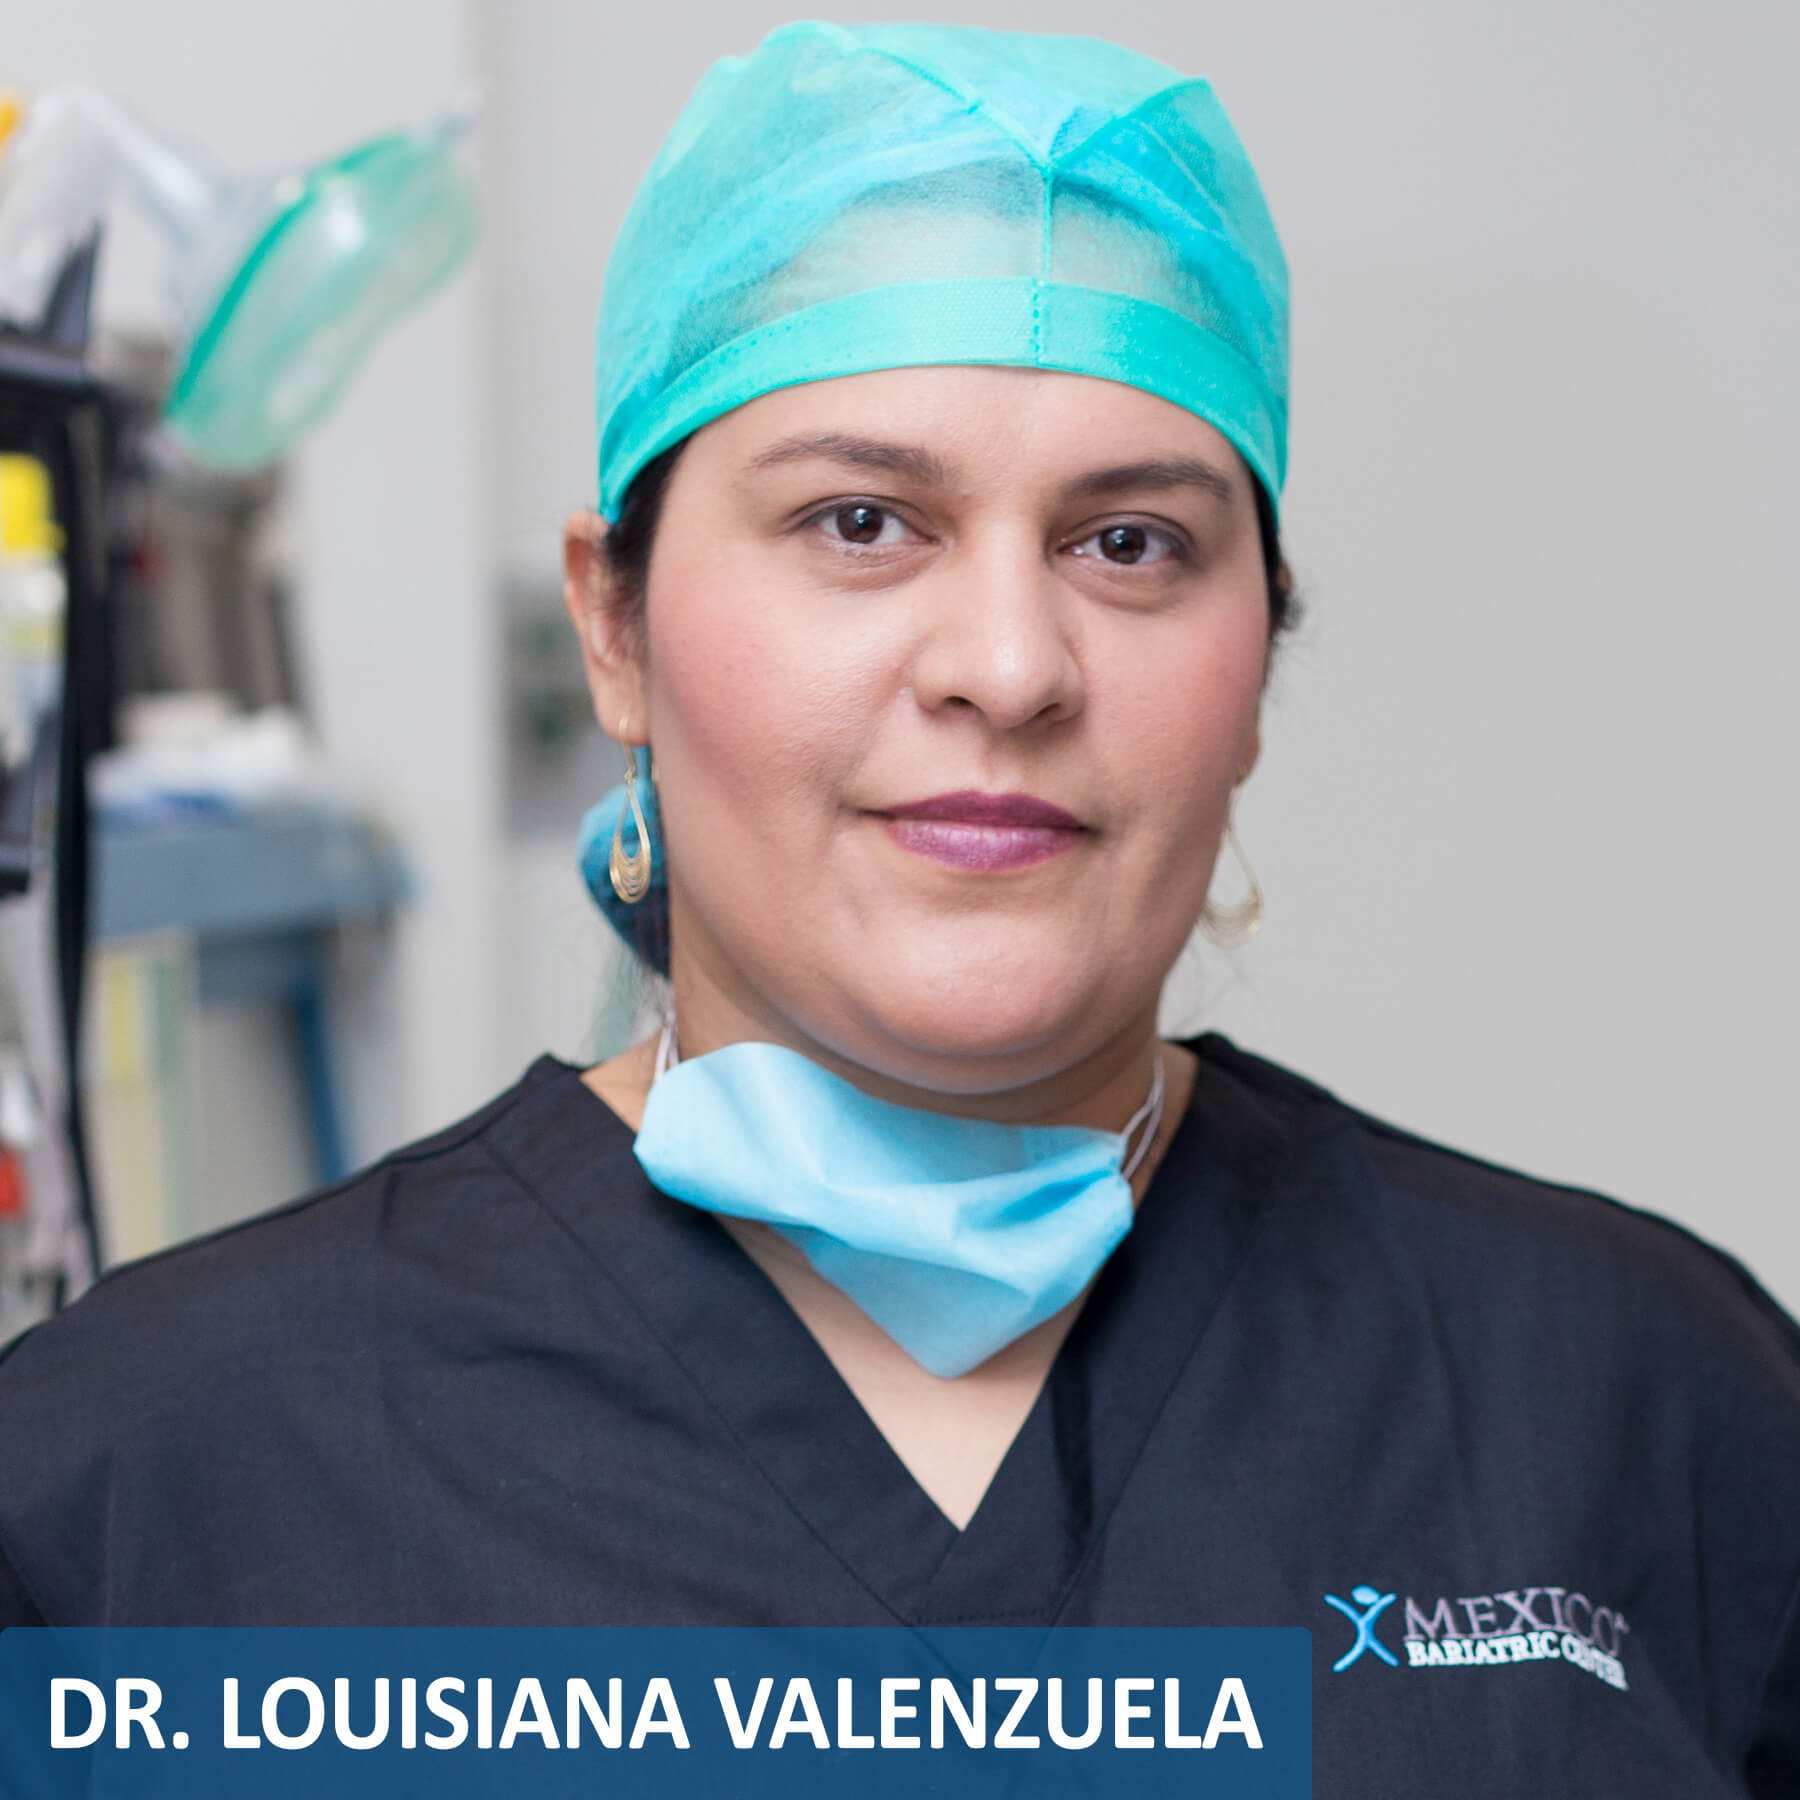 Doctor Louisiana Valenzuela, Bariatric Surgeon